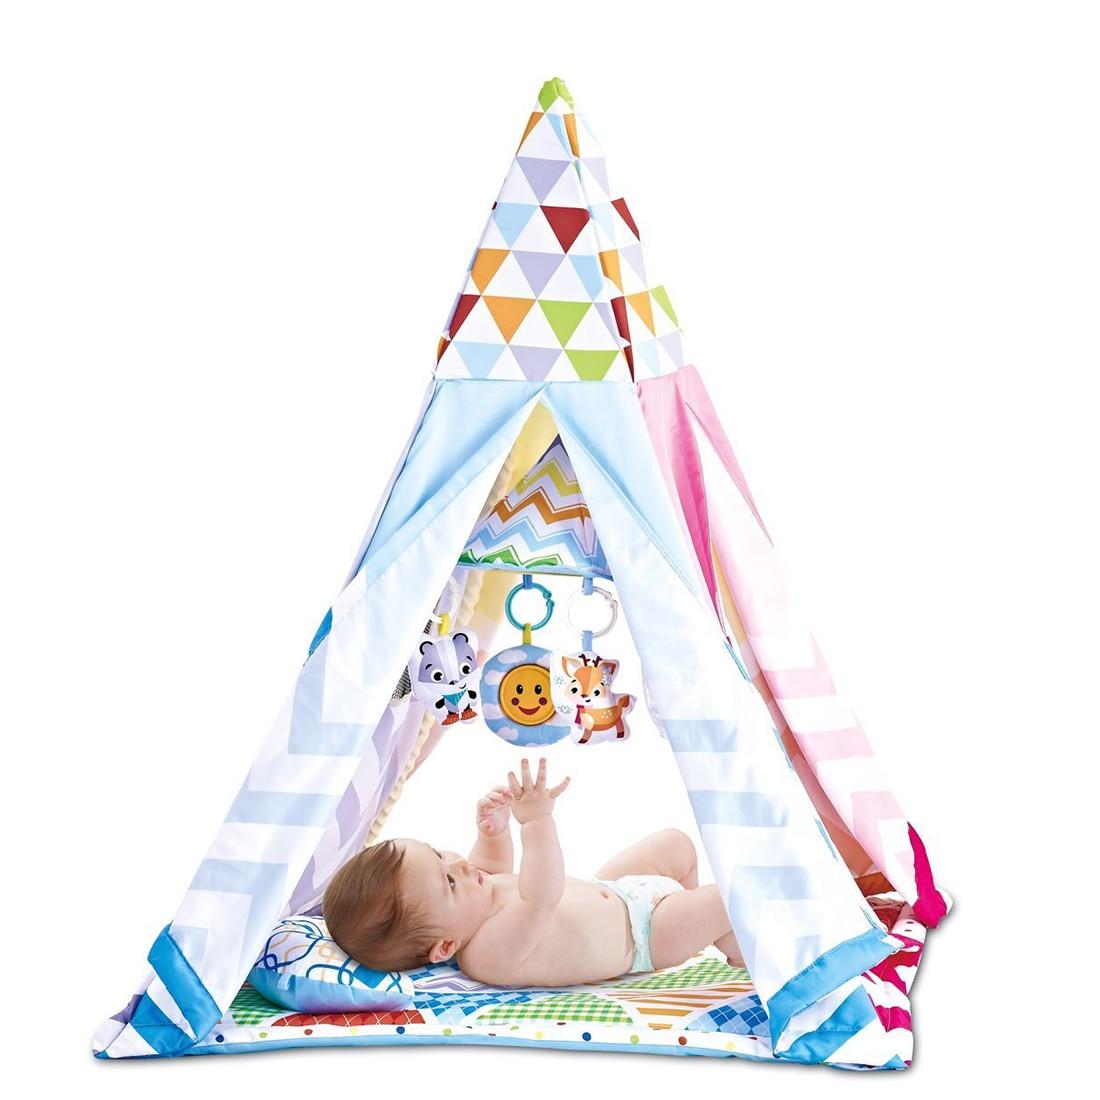 Bébé ramper Pad Playtime tente ramper tapis tente jouet intérieur extérieur jeu tipi-8728